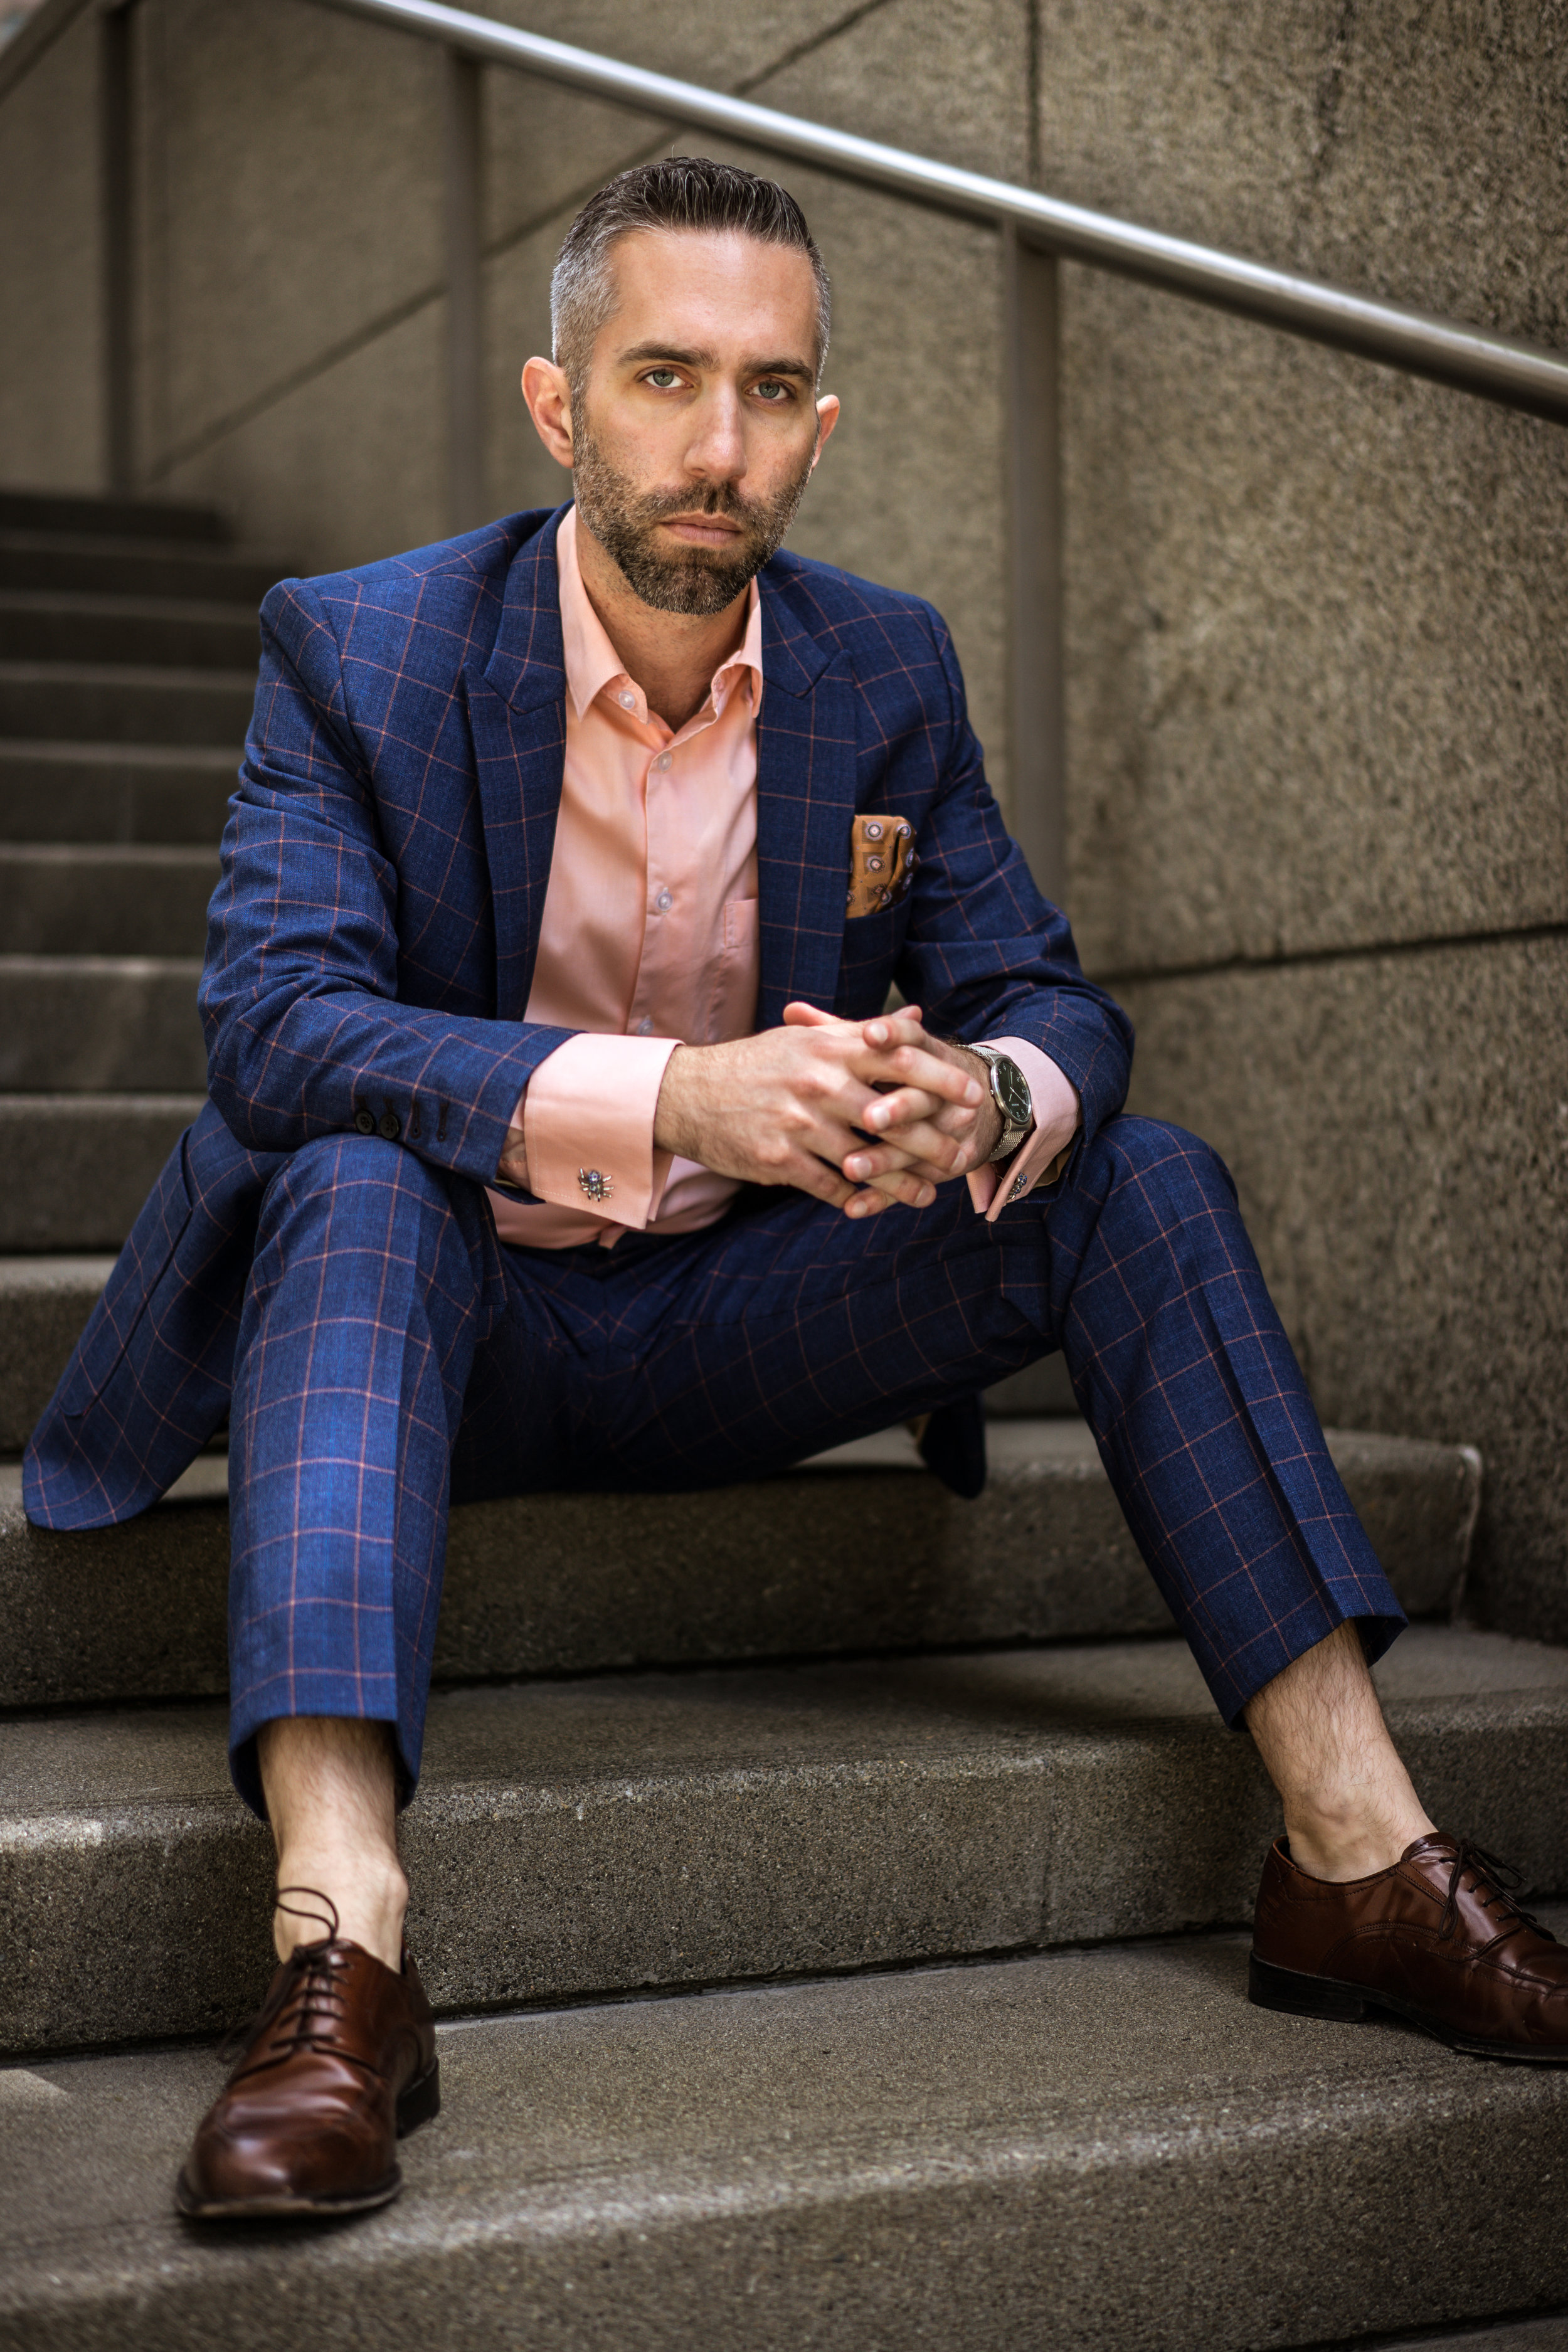 2-Piece suit ($120), dress shirt ($16)